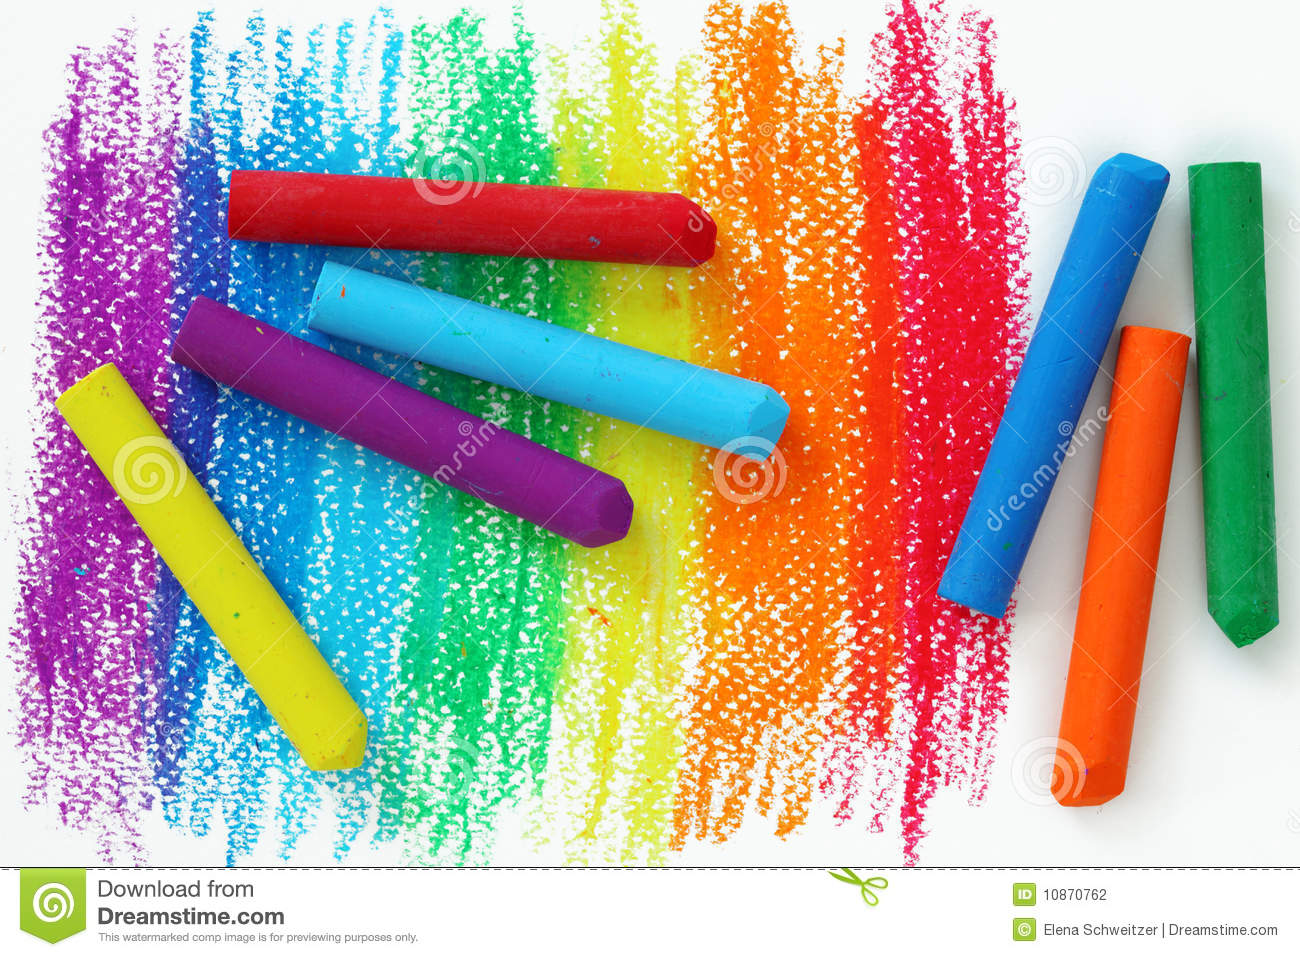 Oil pastel clipart transparent stock Oil Pastel Crayons Stock Photos, Images, & Pictures - 363 Images transparent stock